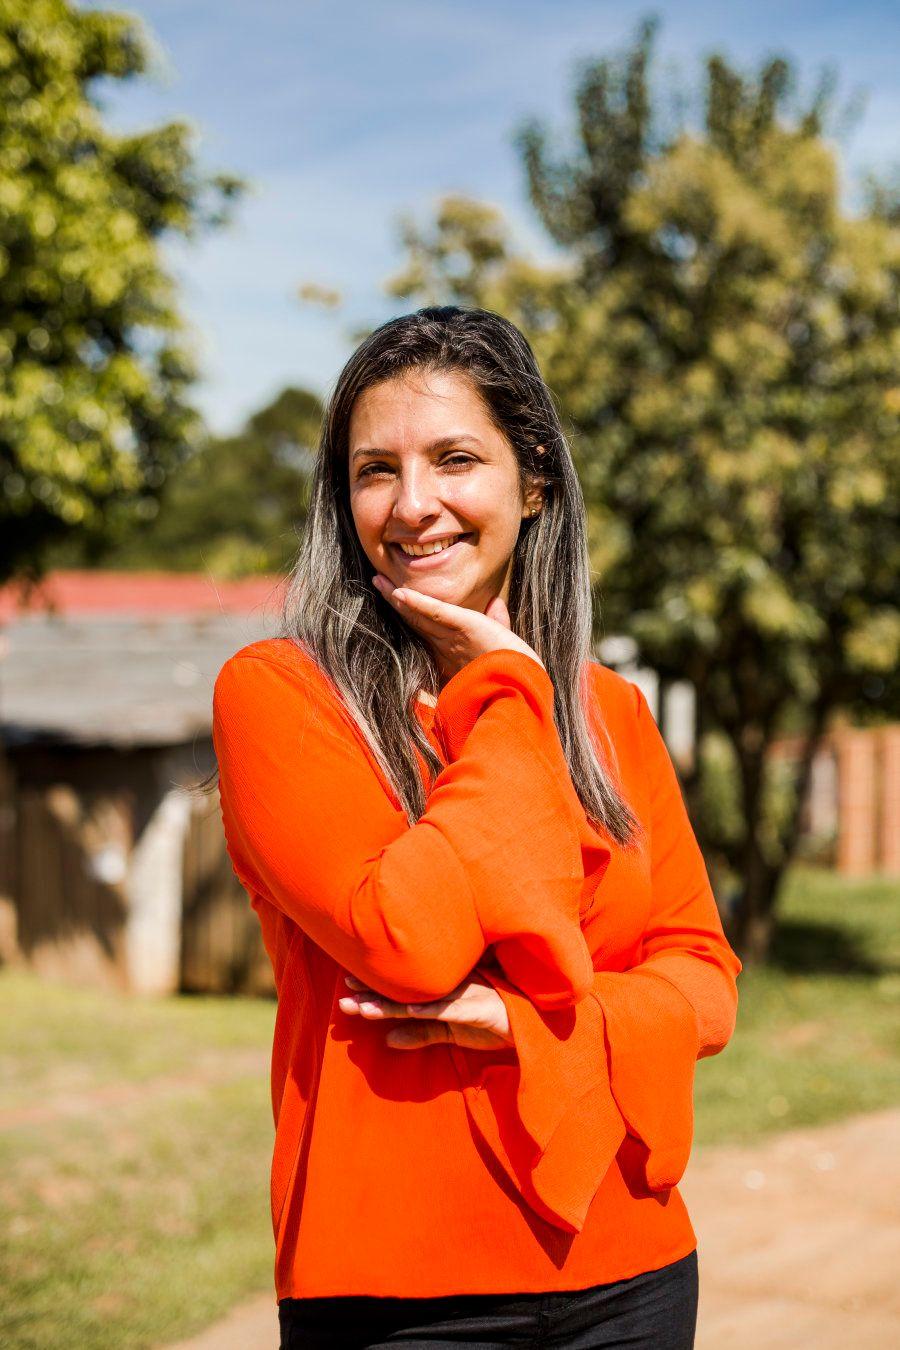 Tamires de Souza: Ela venceu dificuldades após se tornar órfã e mãe no mesmo